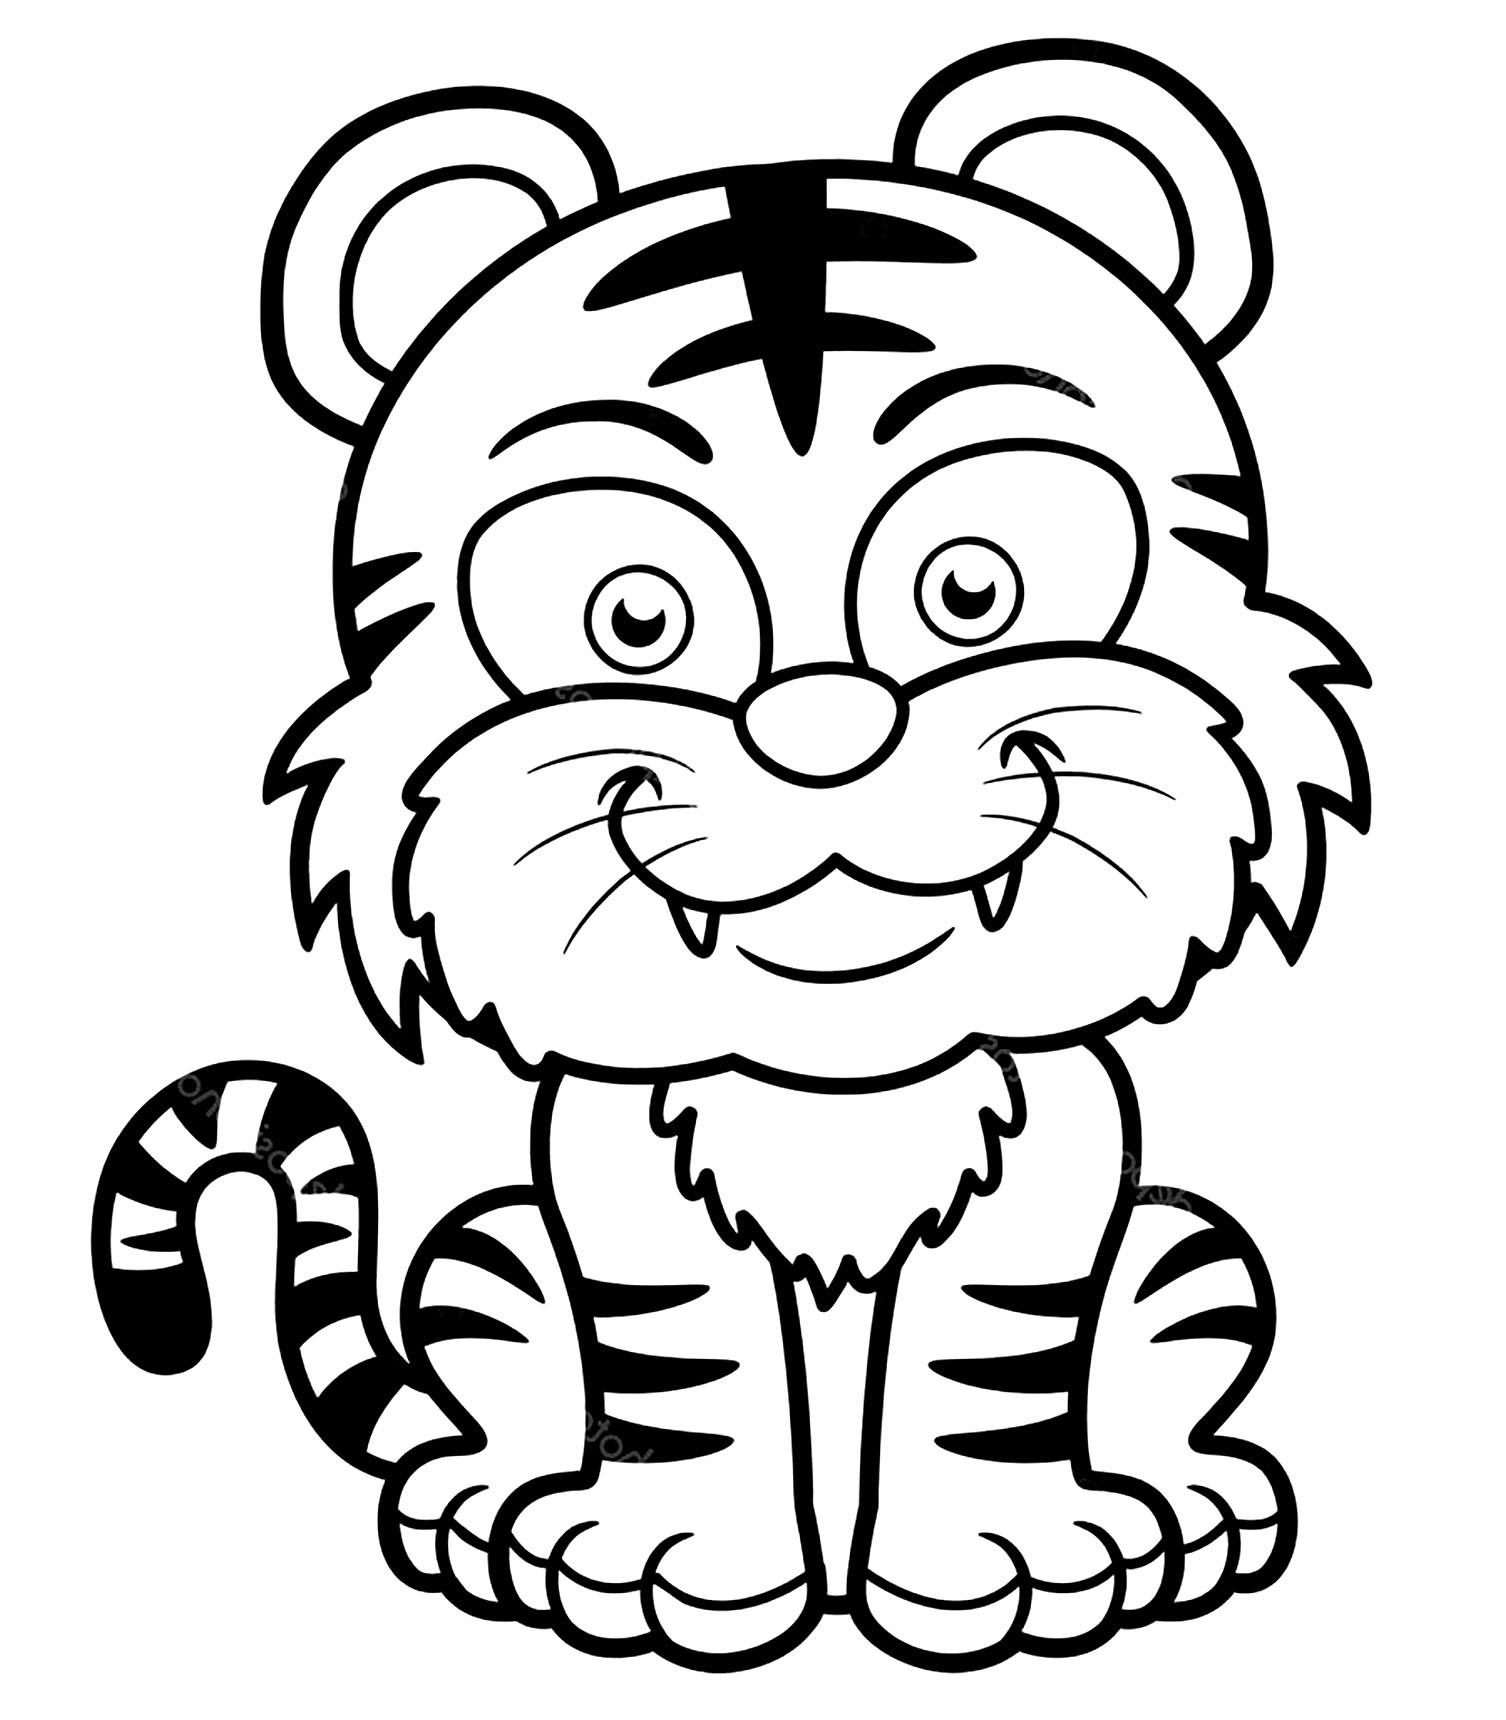 Detroit Tigers Coloring Pages